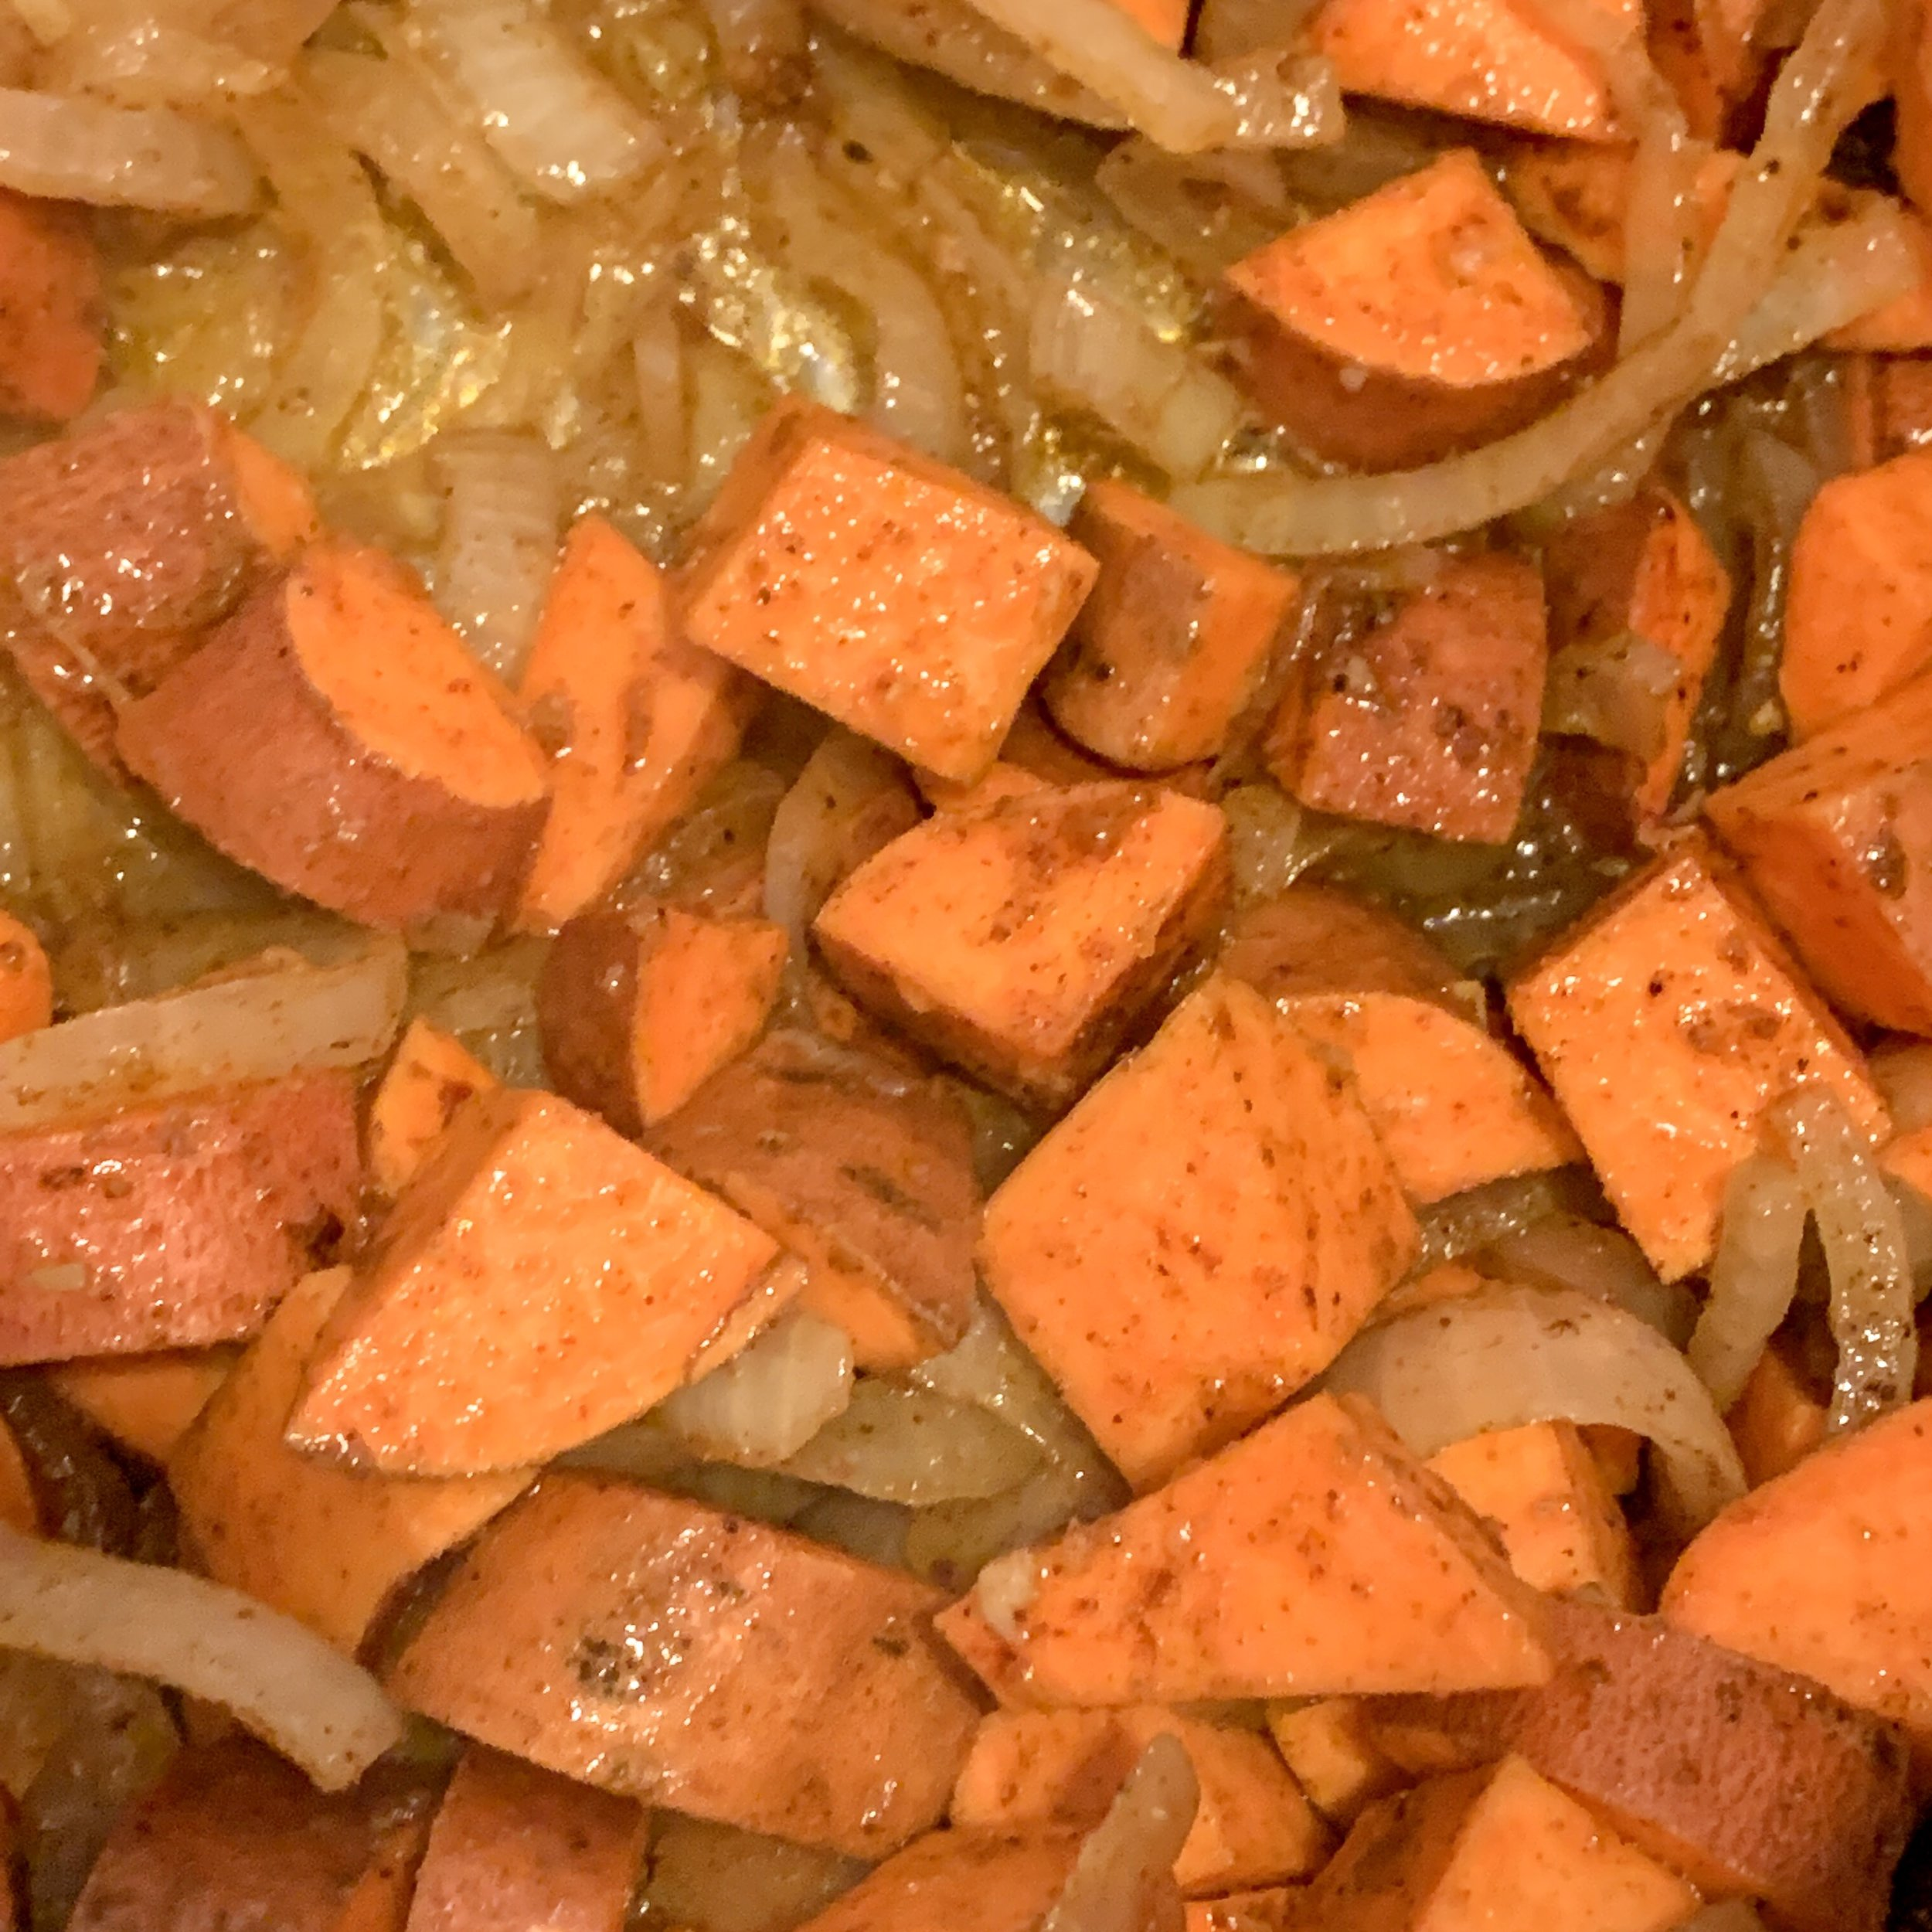 Toss in the sweet potatoes spicesVegan Gluten Free Bourbon Chili